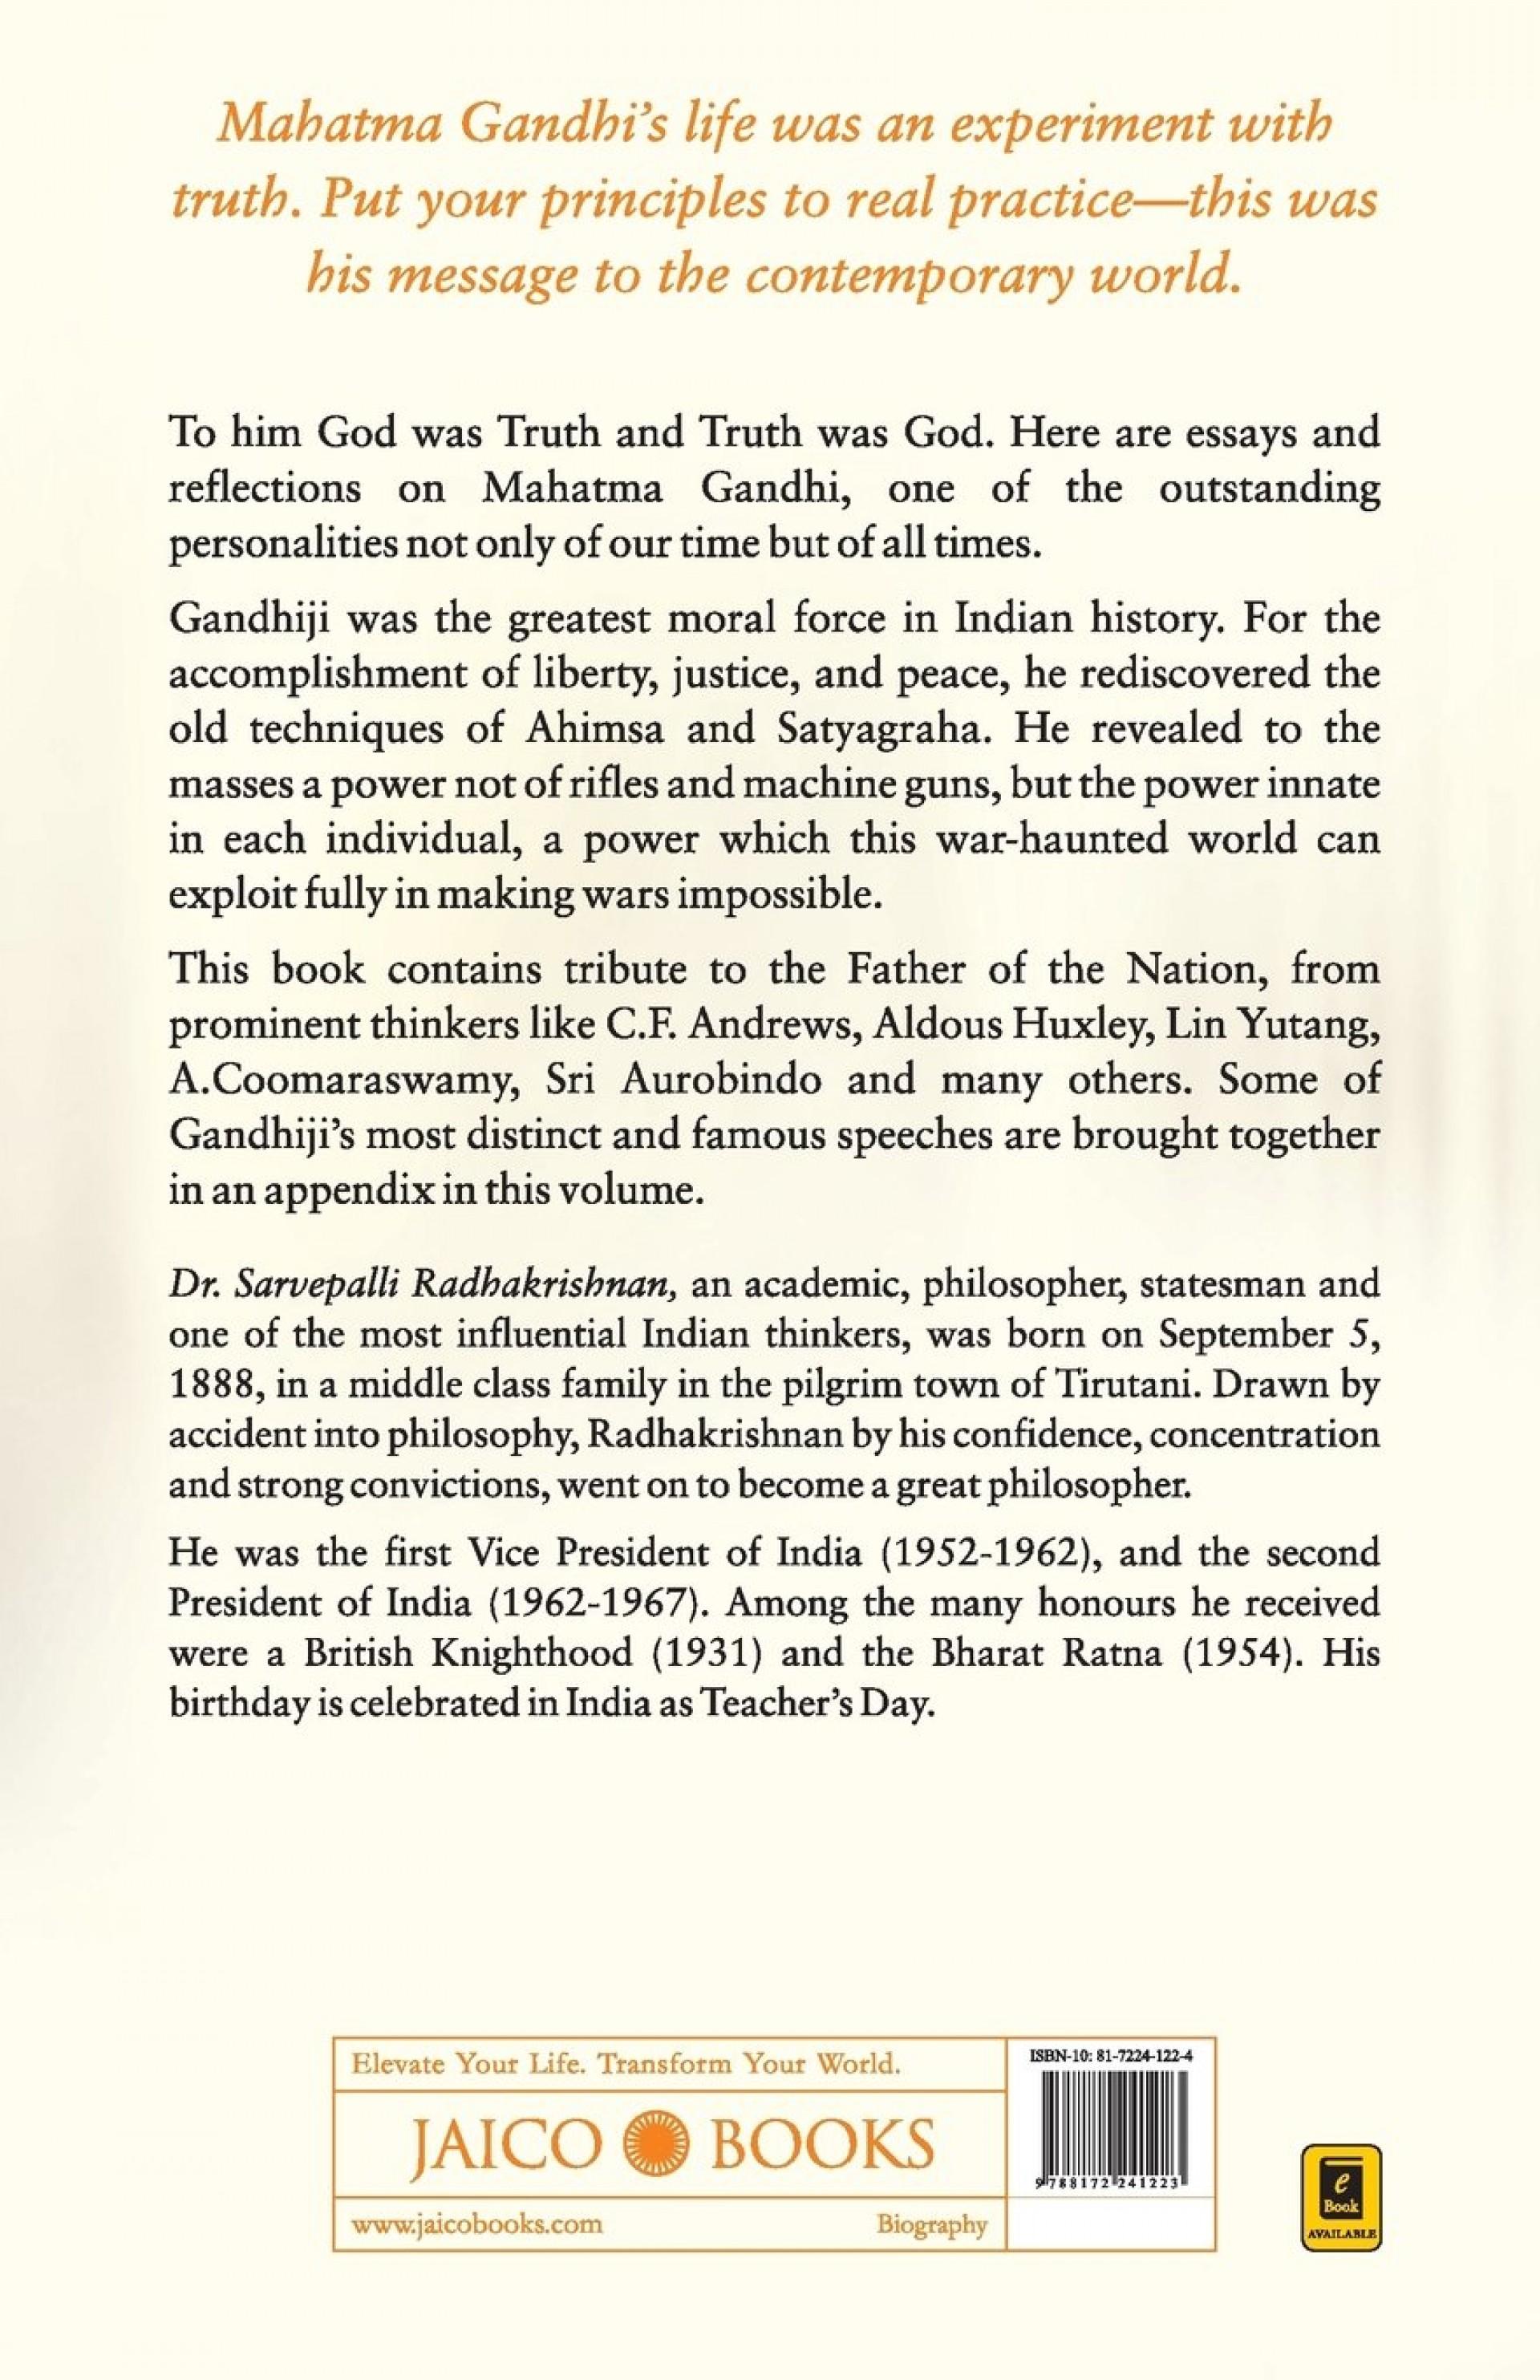 009 Gandhiji Essay 71zp3a1uw8l Sensational Mahatma Gandhi In Gujarati Pdf Free Download Hindi Language Ma Nibandh 1920